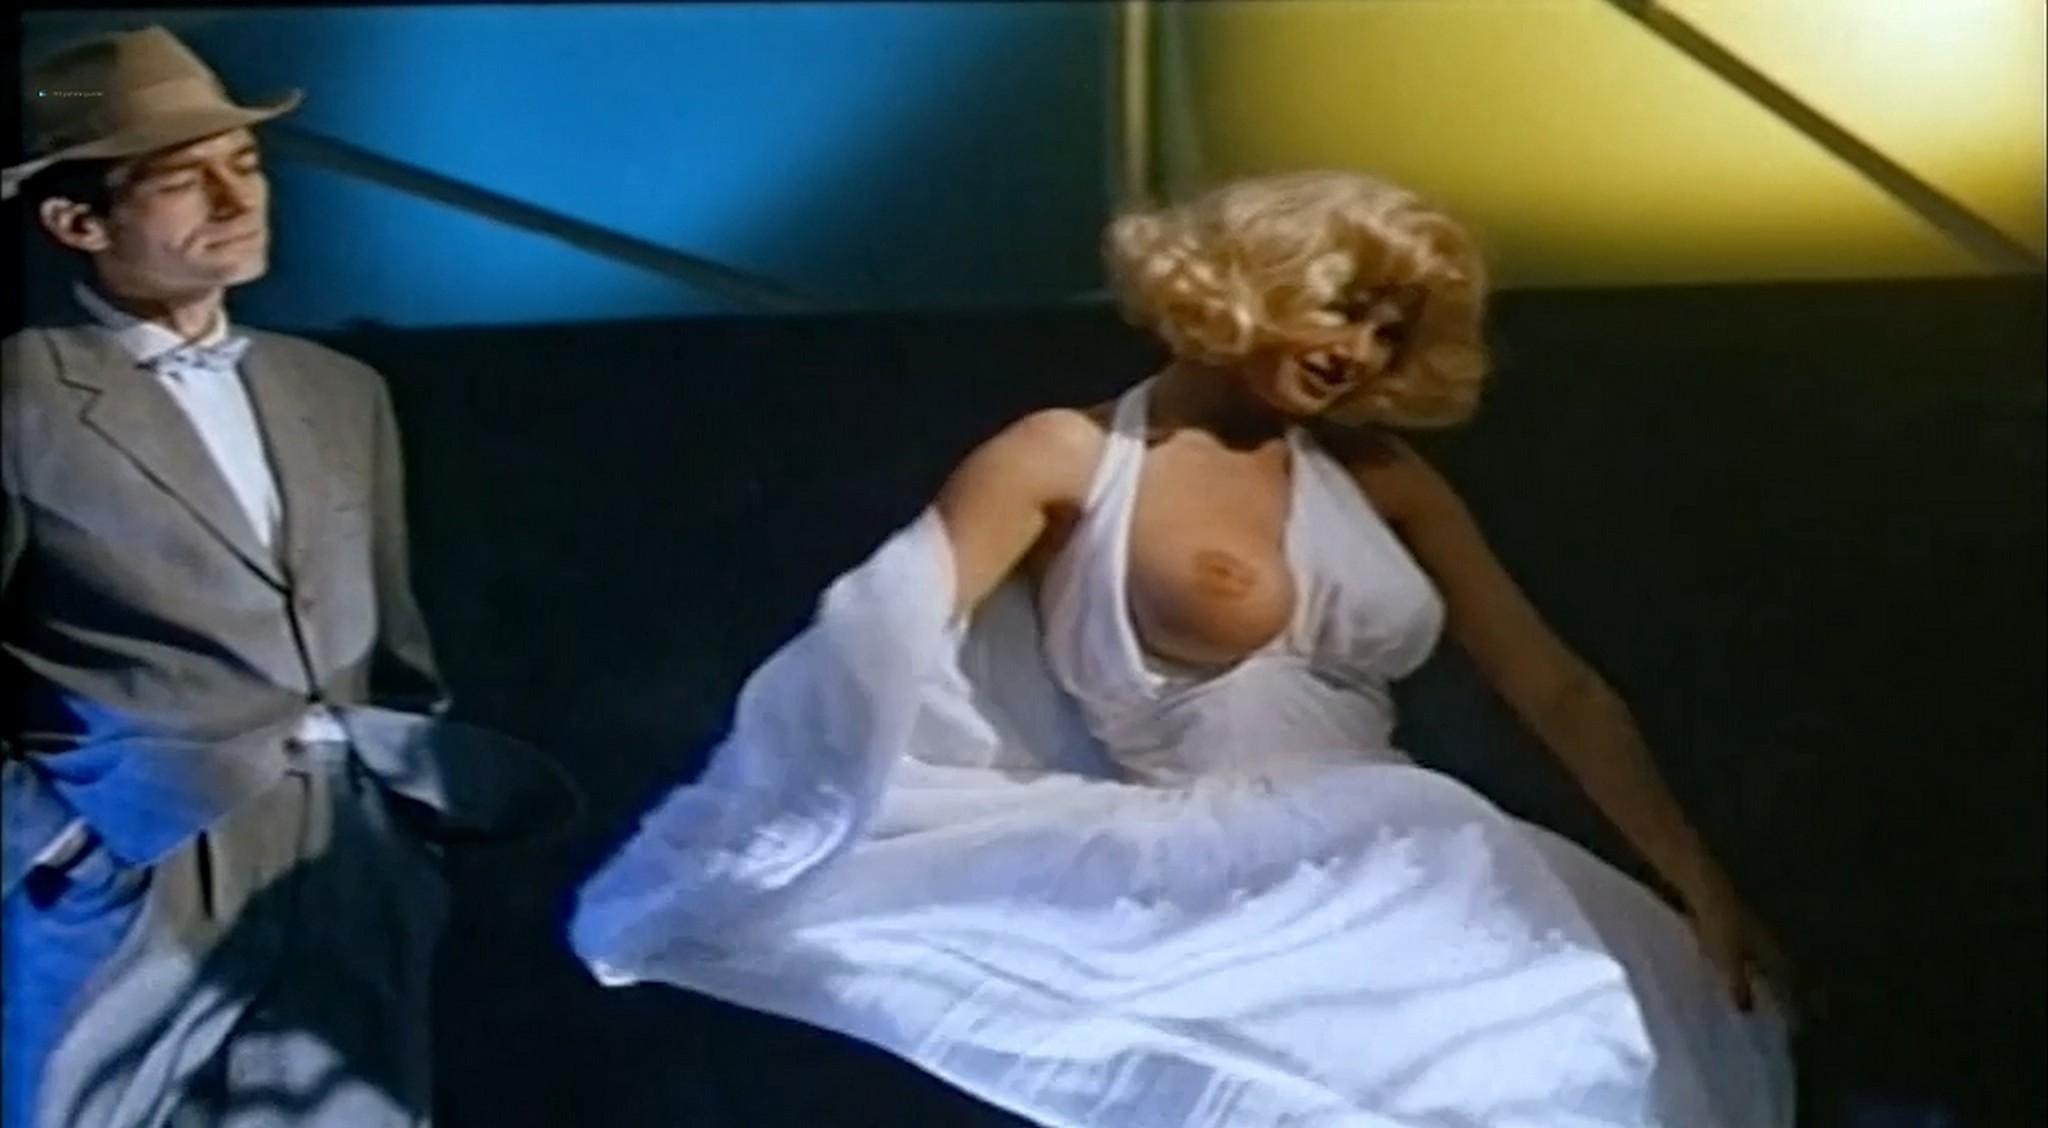 Carolyn Monroe nude Caroline Laurence and others nude sex Emmanuelle 7 1993 DVDRip 9